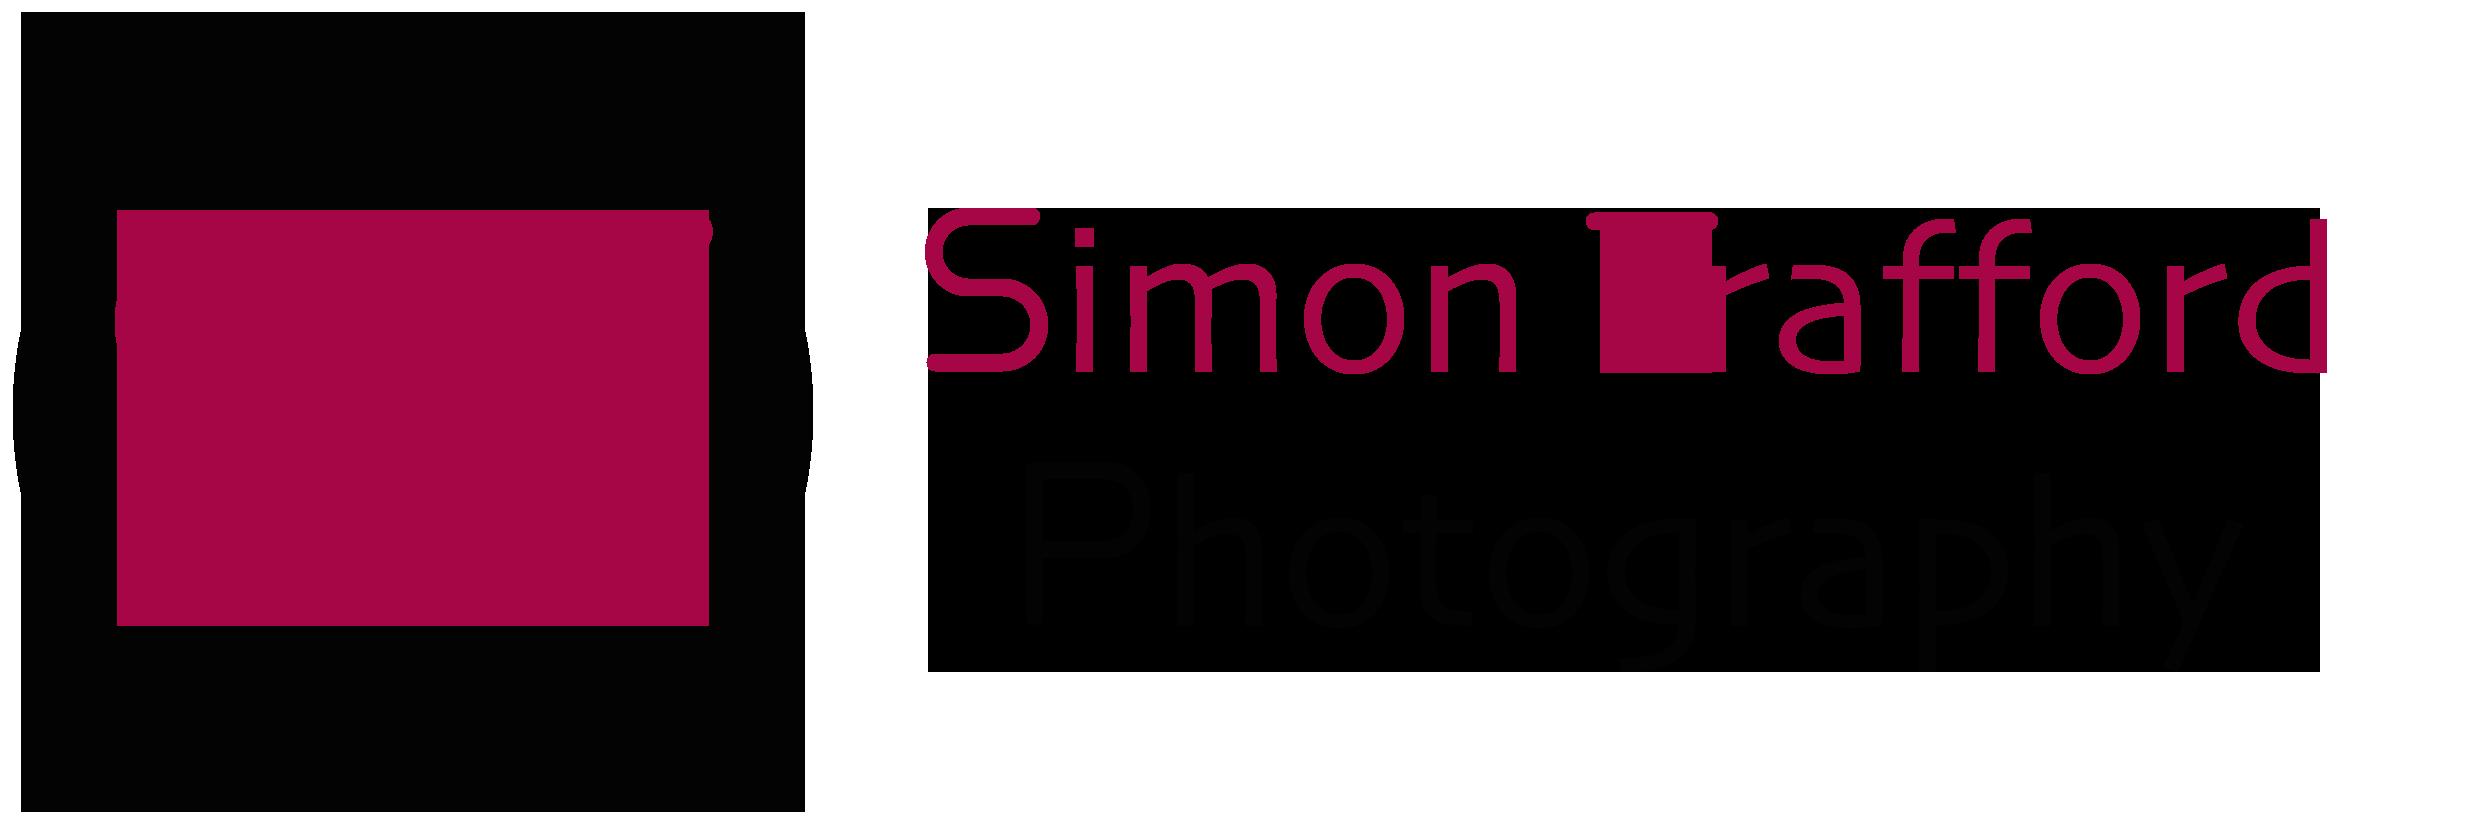 Simon Trafford